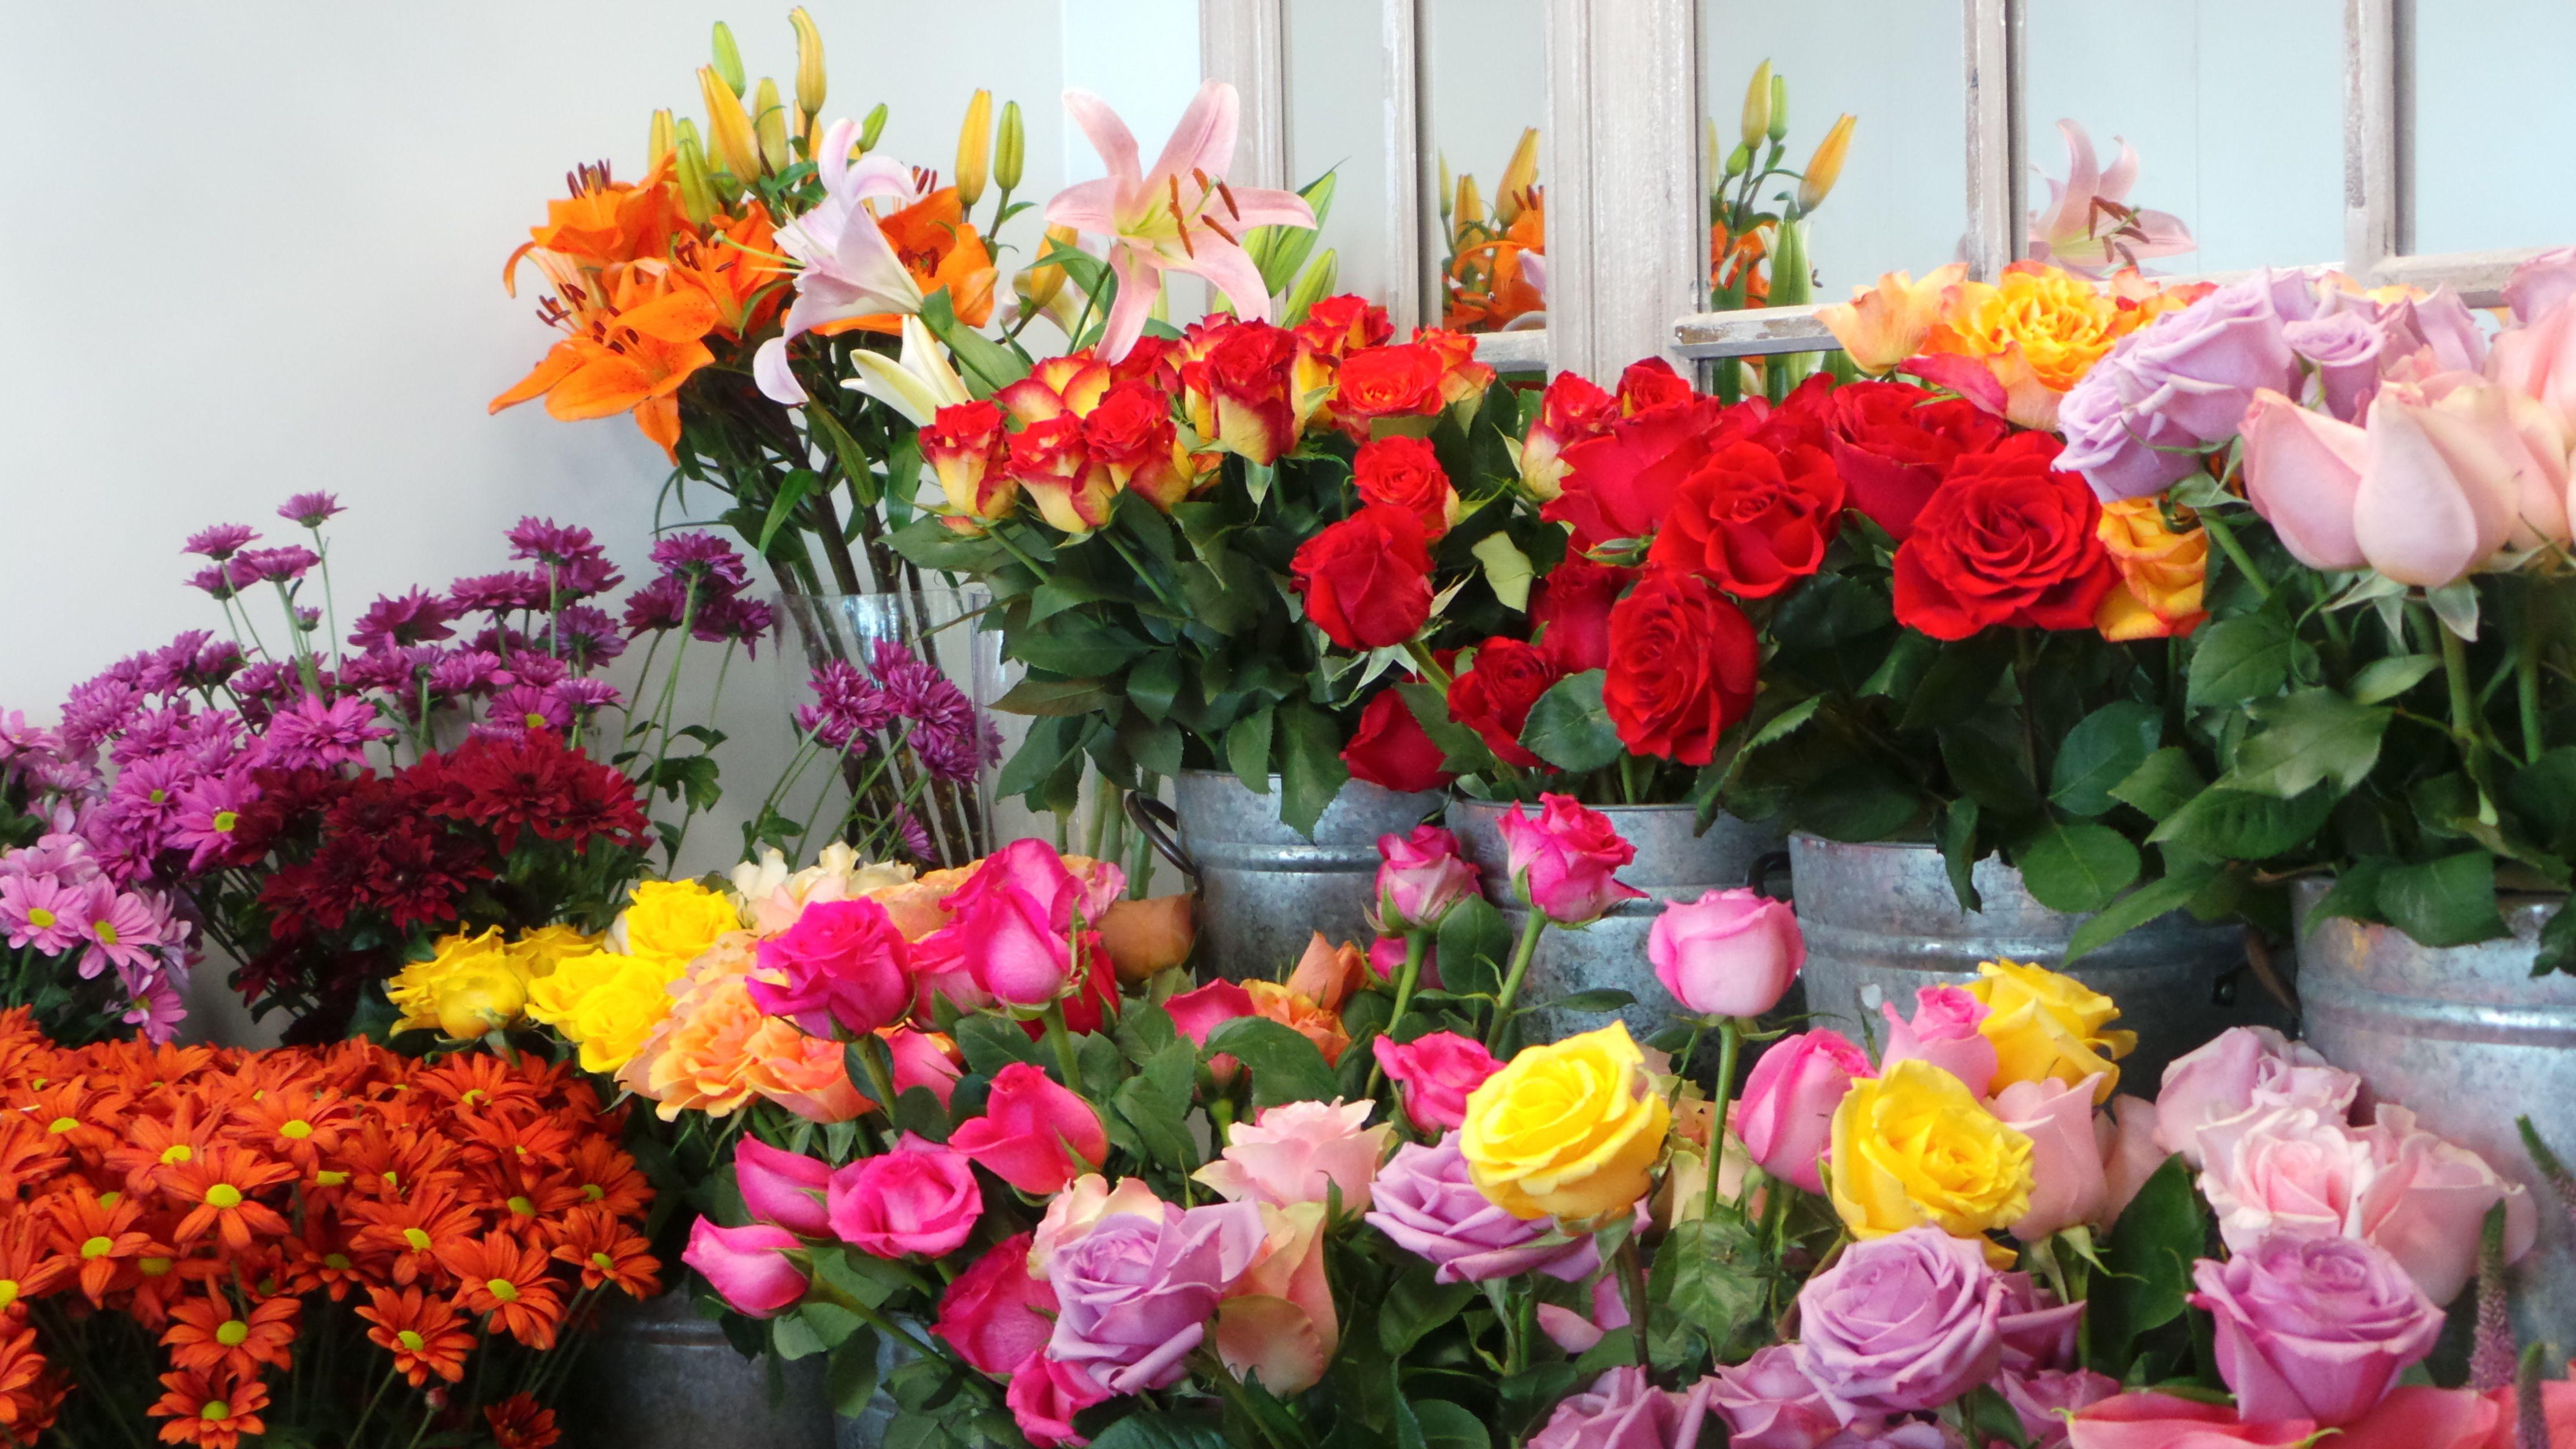 flower vase with artificial flowers online shopping of send flowers in dubaiartificial flowers onlineartificial floral pertaining to send flowers in dubaiartificial flowers onlineartificial floral arrangementsbouquet of roses